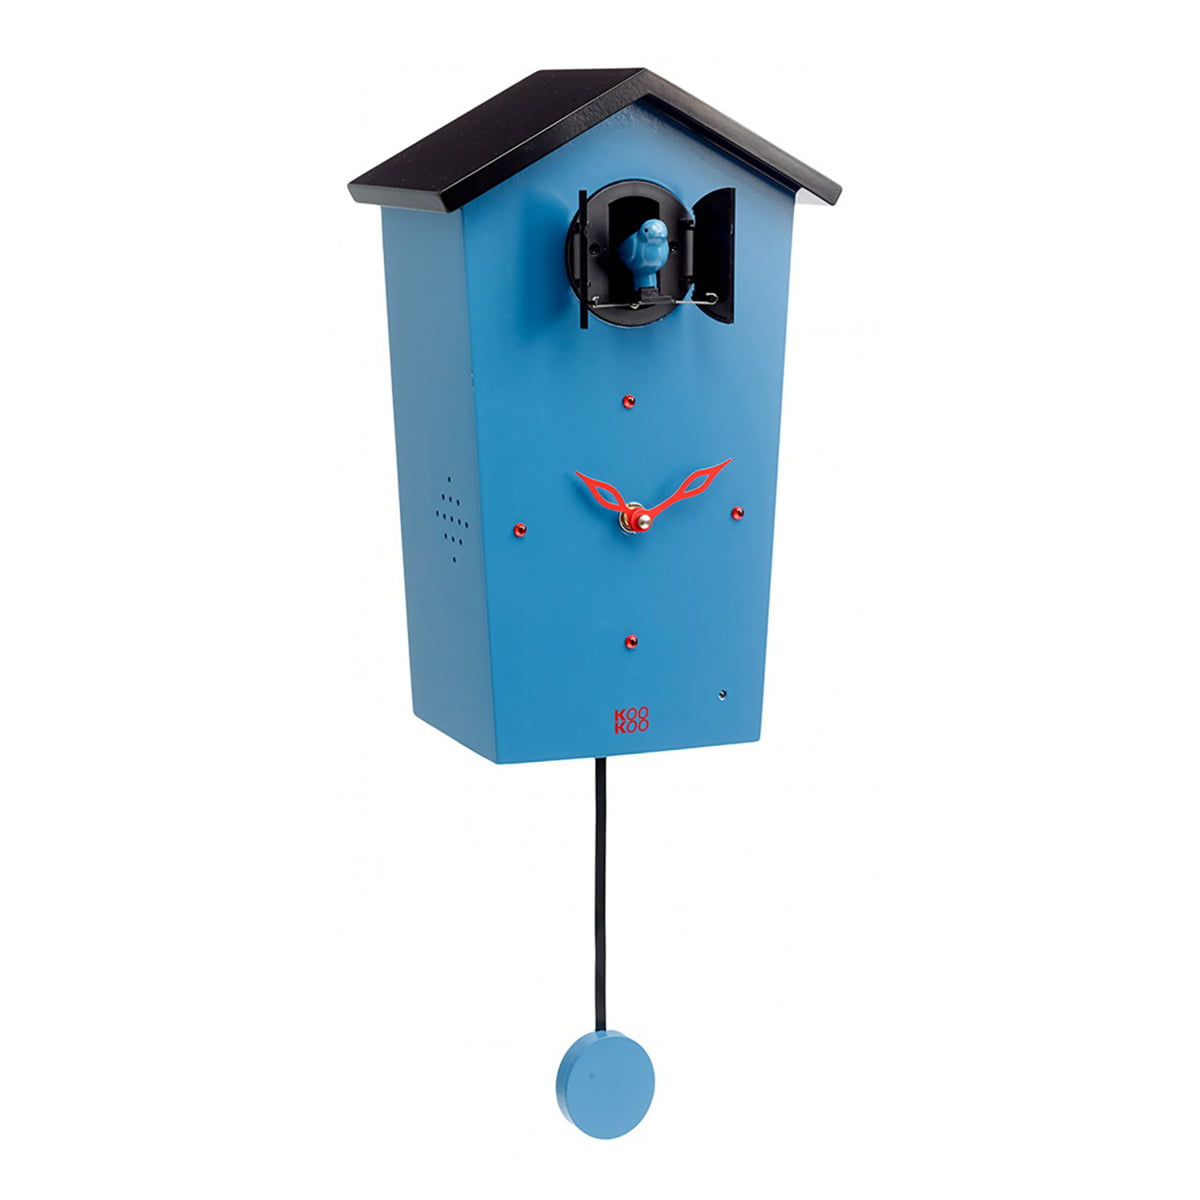 KooKoo - Bird House Kuckucksuhr, blau (Limited Edition) | Dekoration > Uhren > Kuckucksuhren | Blau | Mdf holz | KooKoo